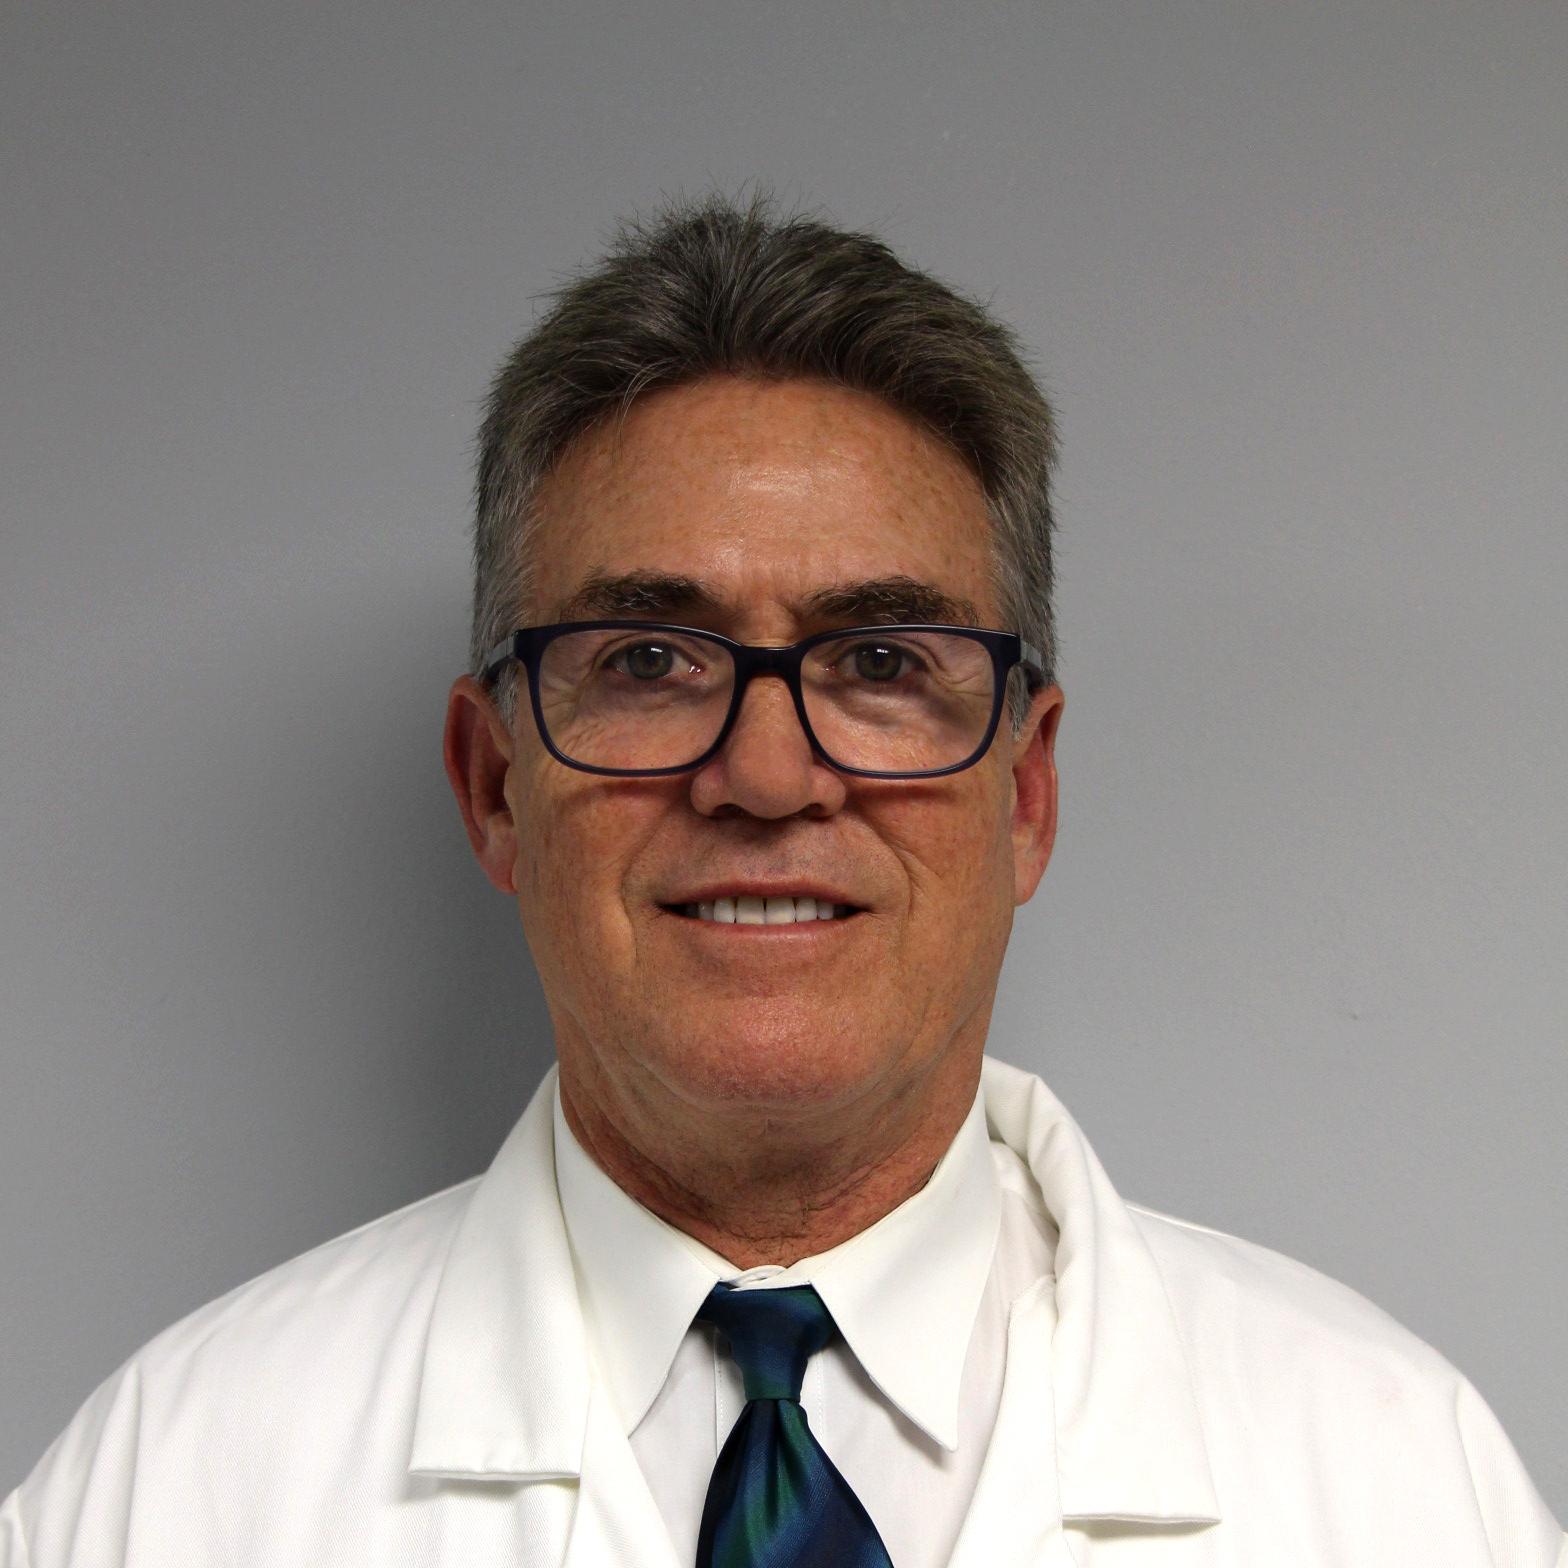 Dr. Jeffrey Walker